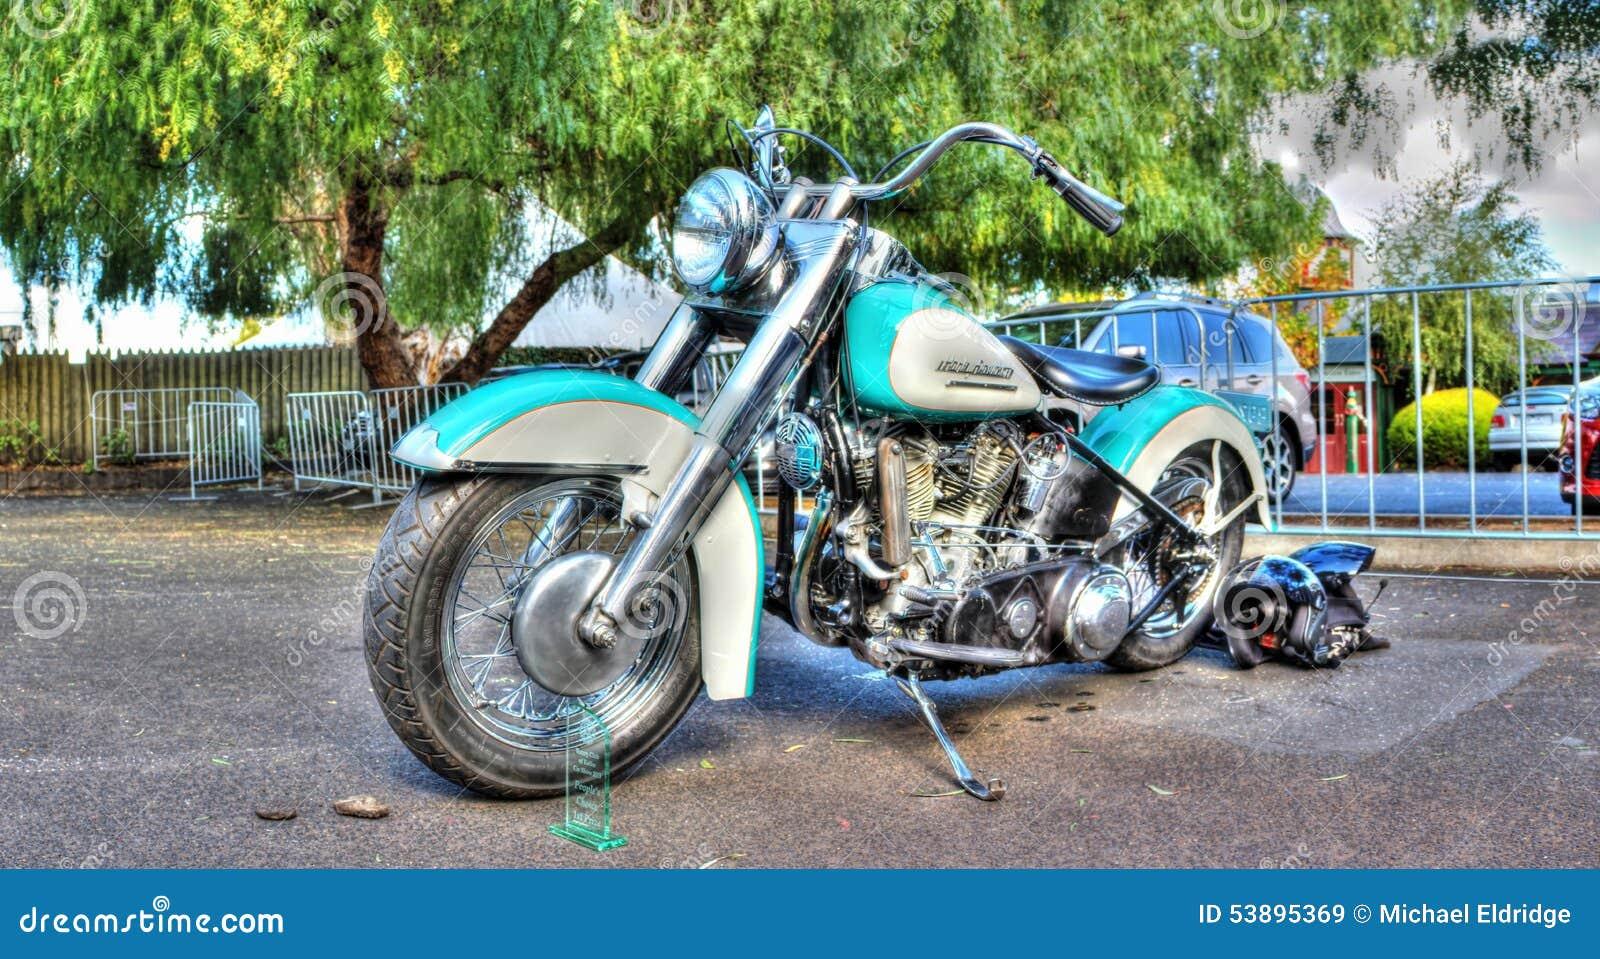 light blue and white Harley Davidson Motorbike on dsplay.